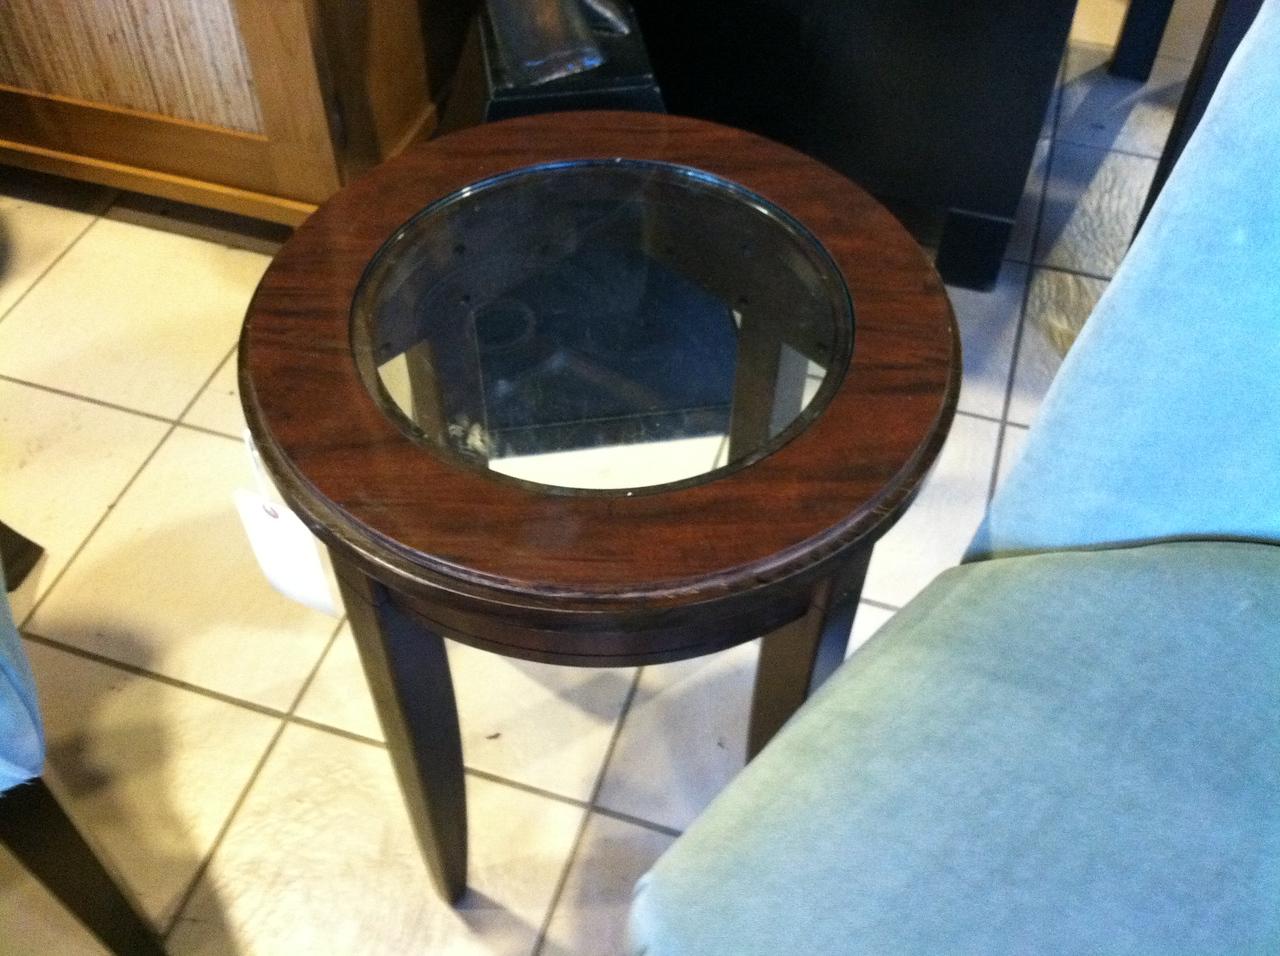 Prospective $49 end table for LR